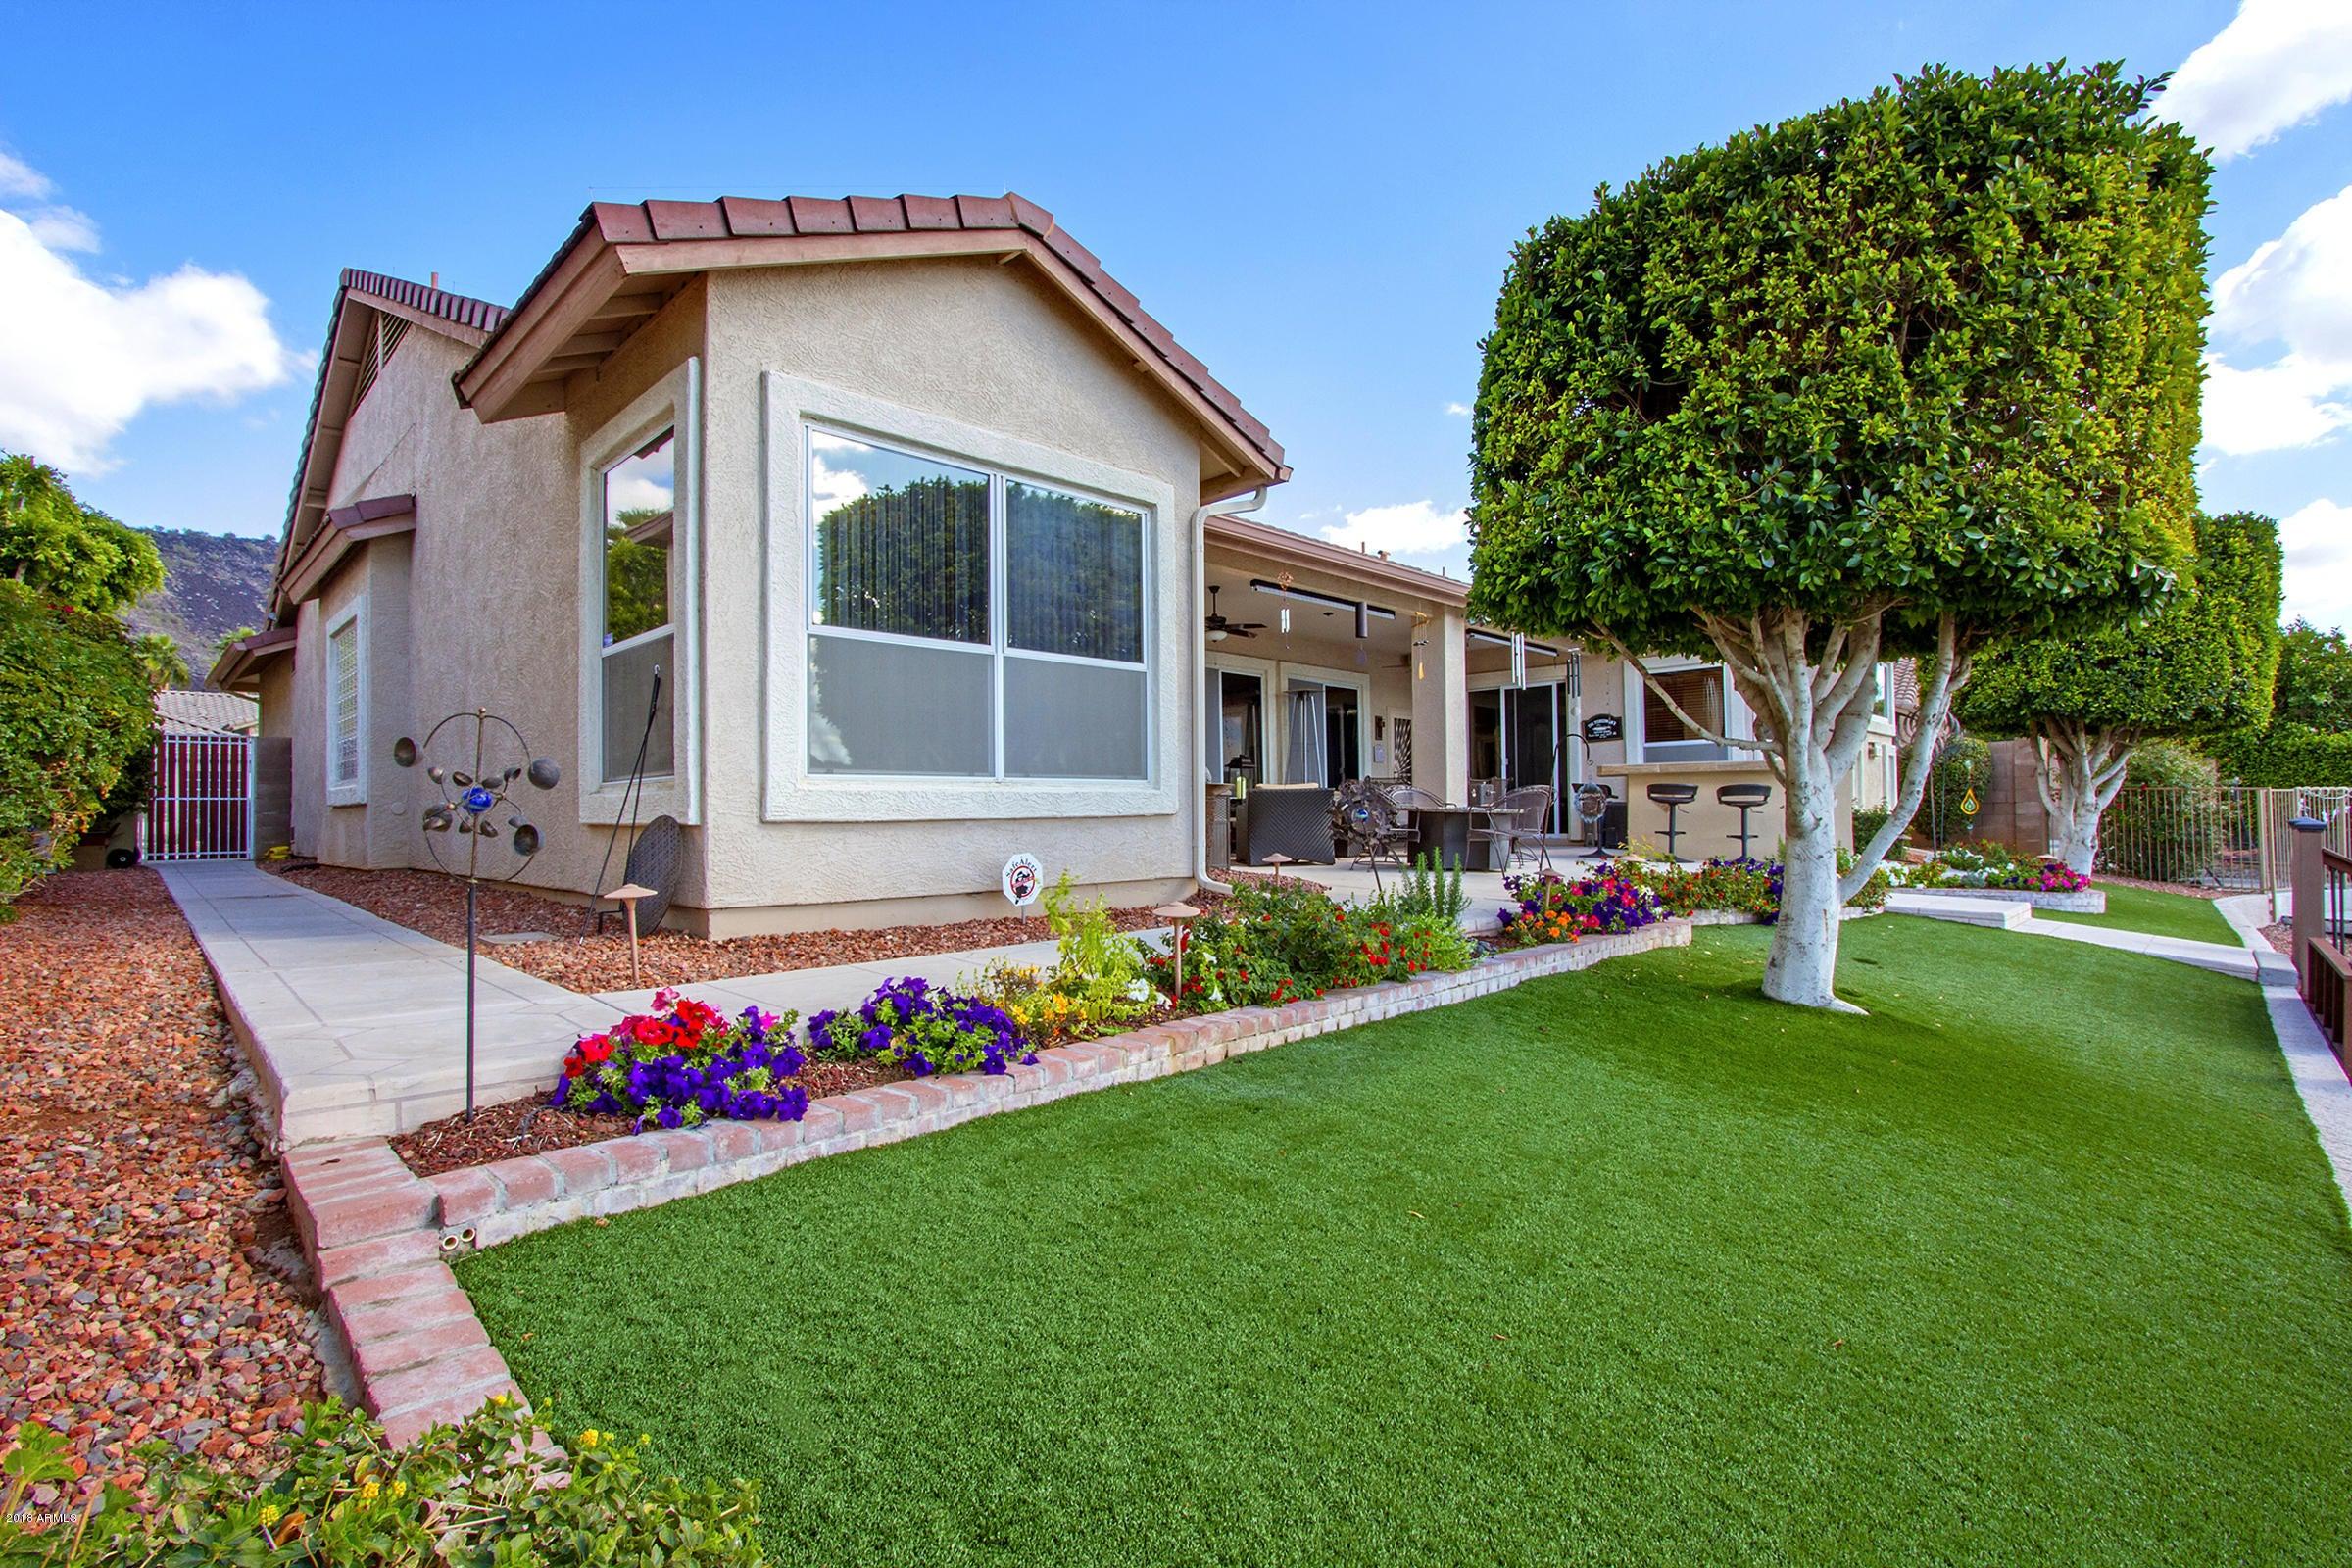 20616 N 53RD Avenue Glendale, AZ 85308 - MLS #: 5803054